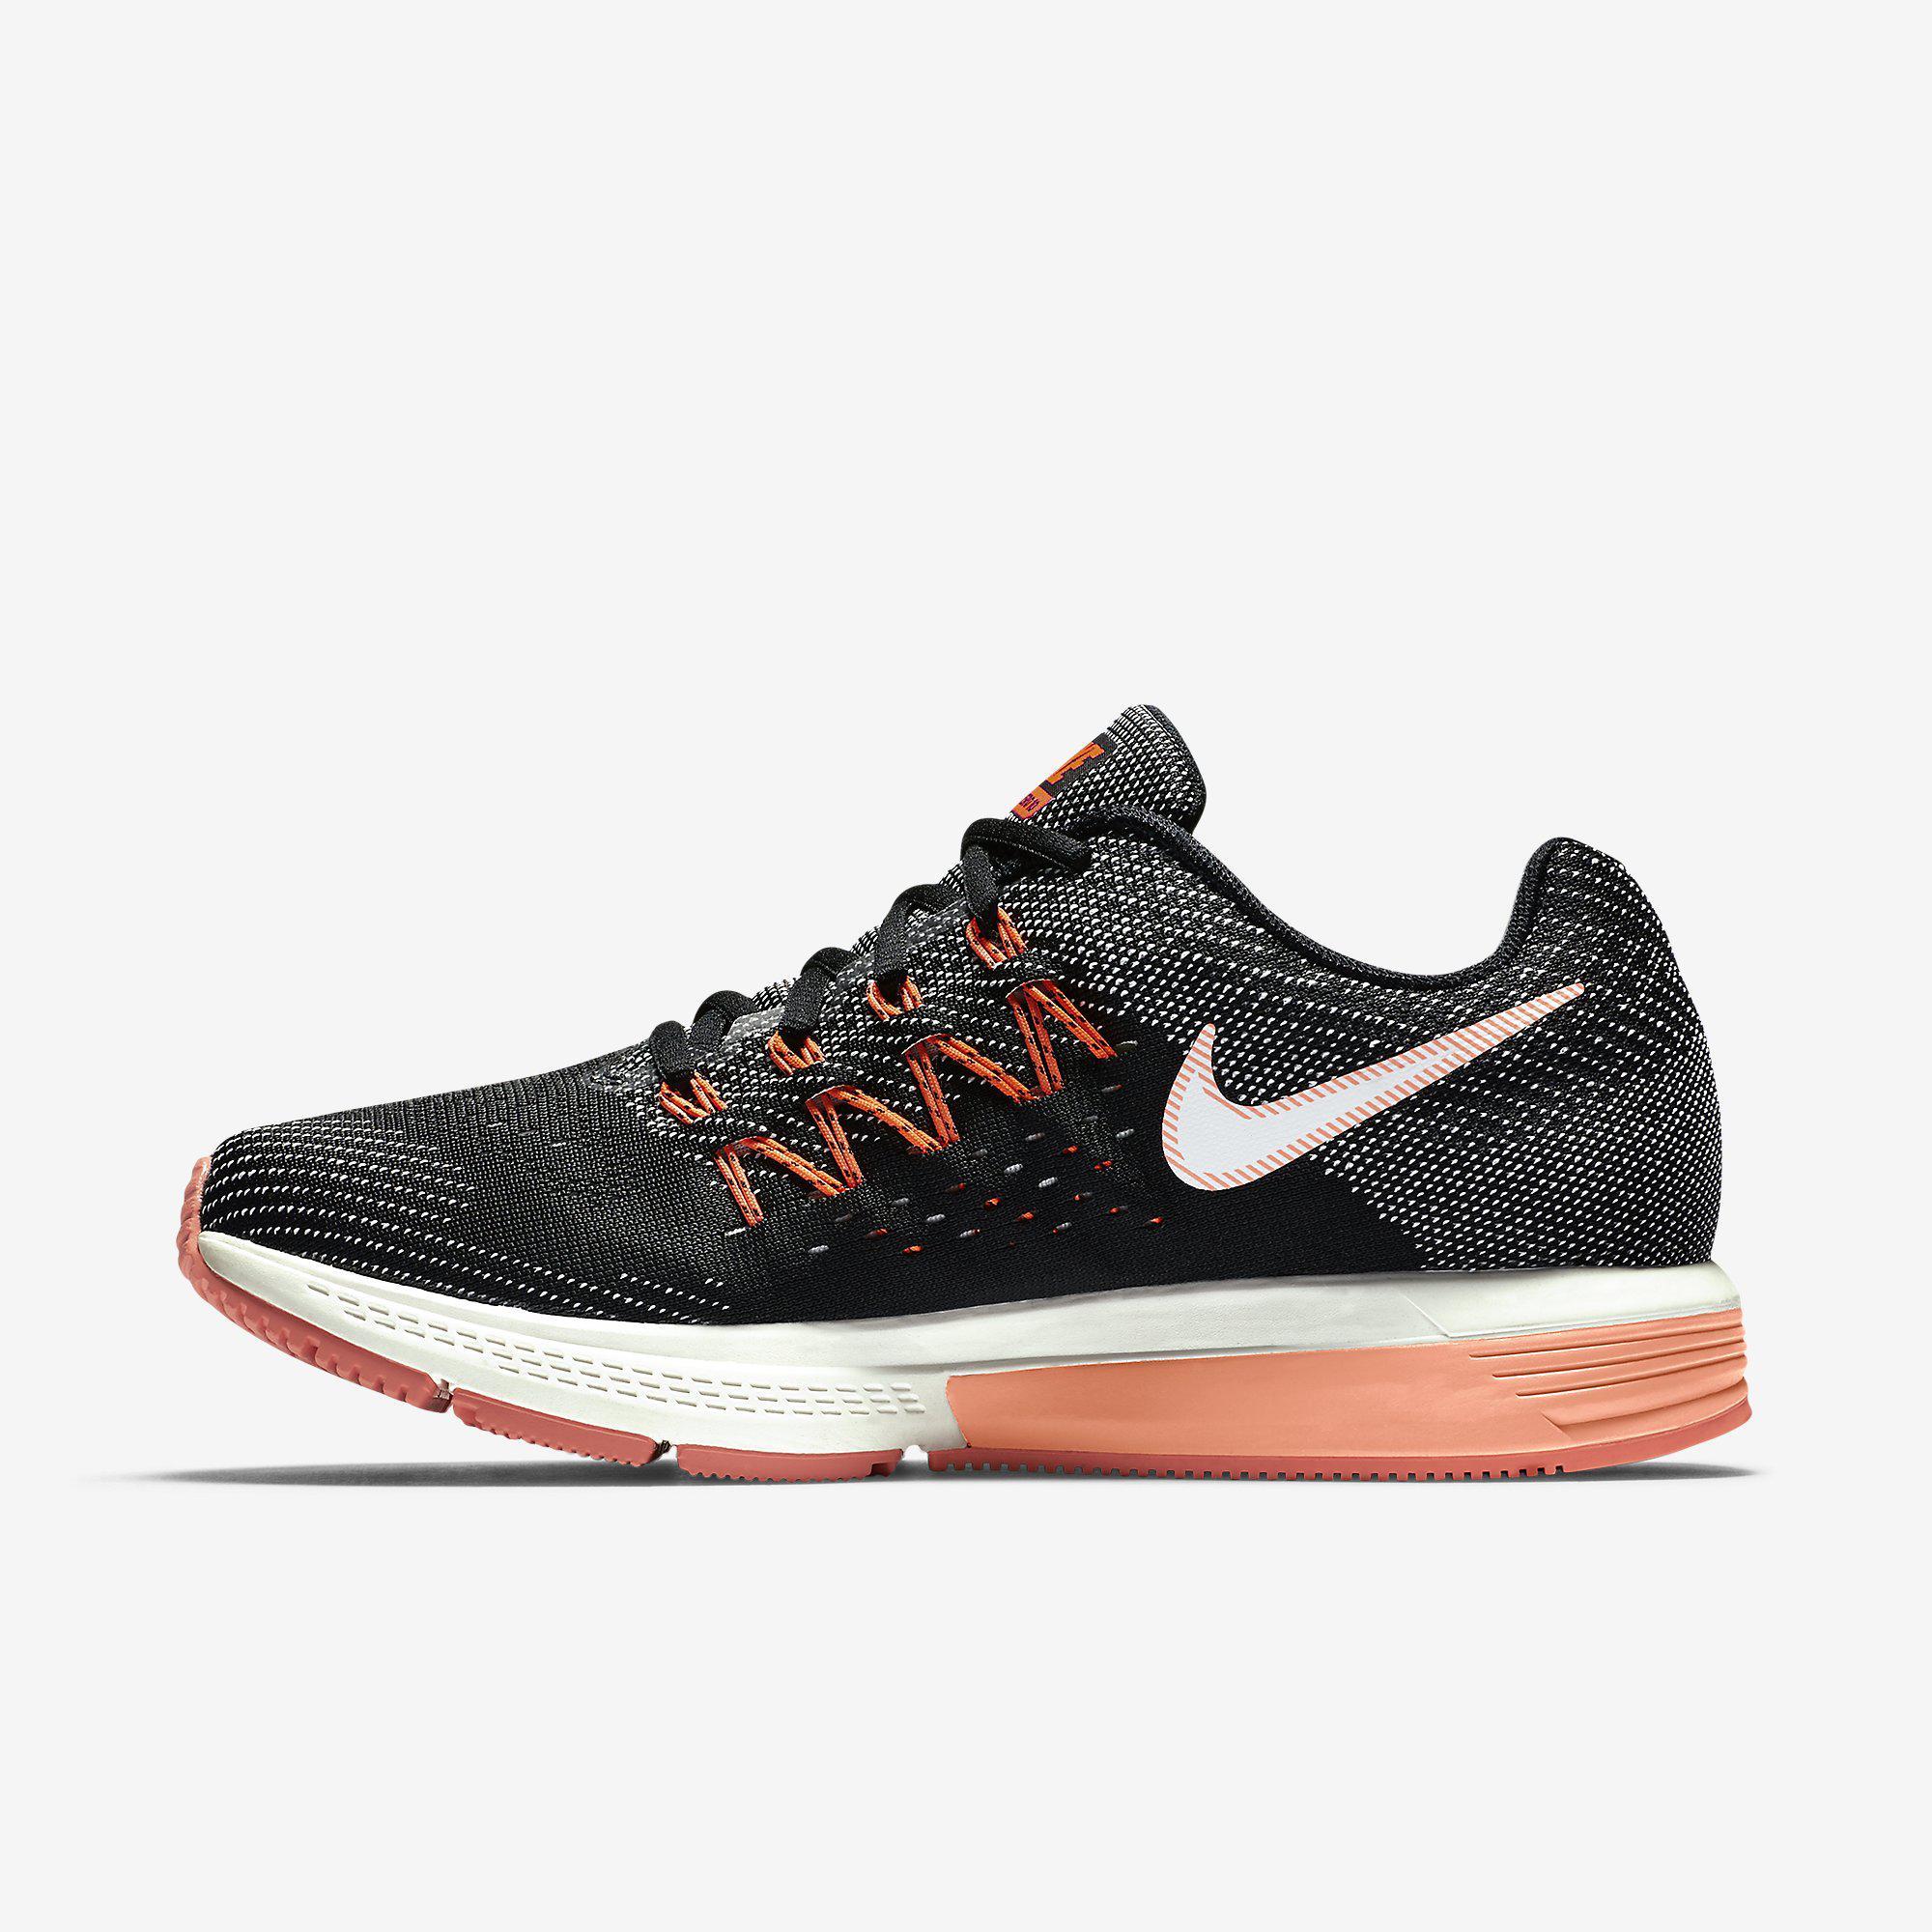 Nike Womens Air Zoom Vomero 10 Running Shoes - Black Orange ... 5489fe4ae